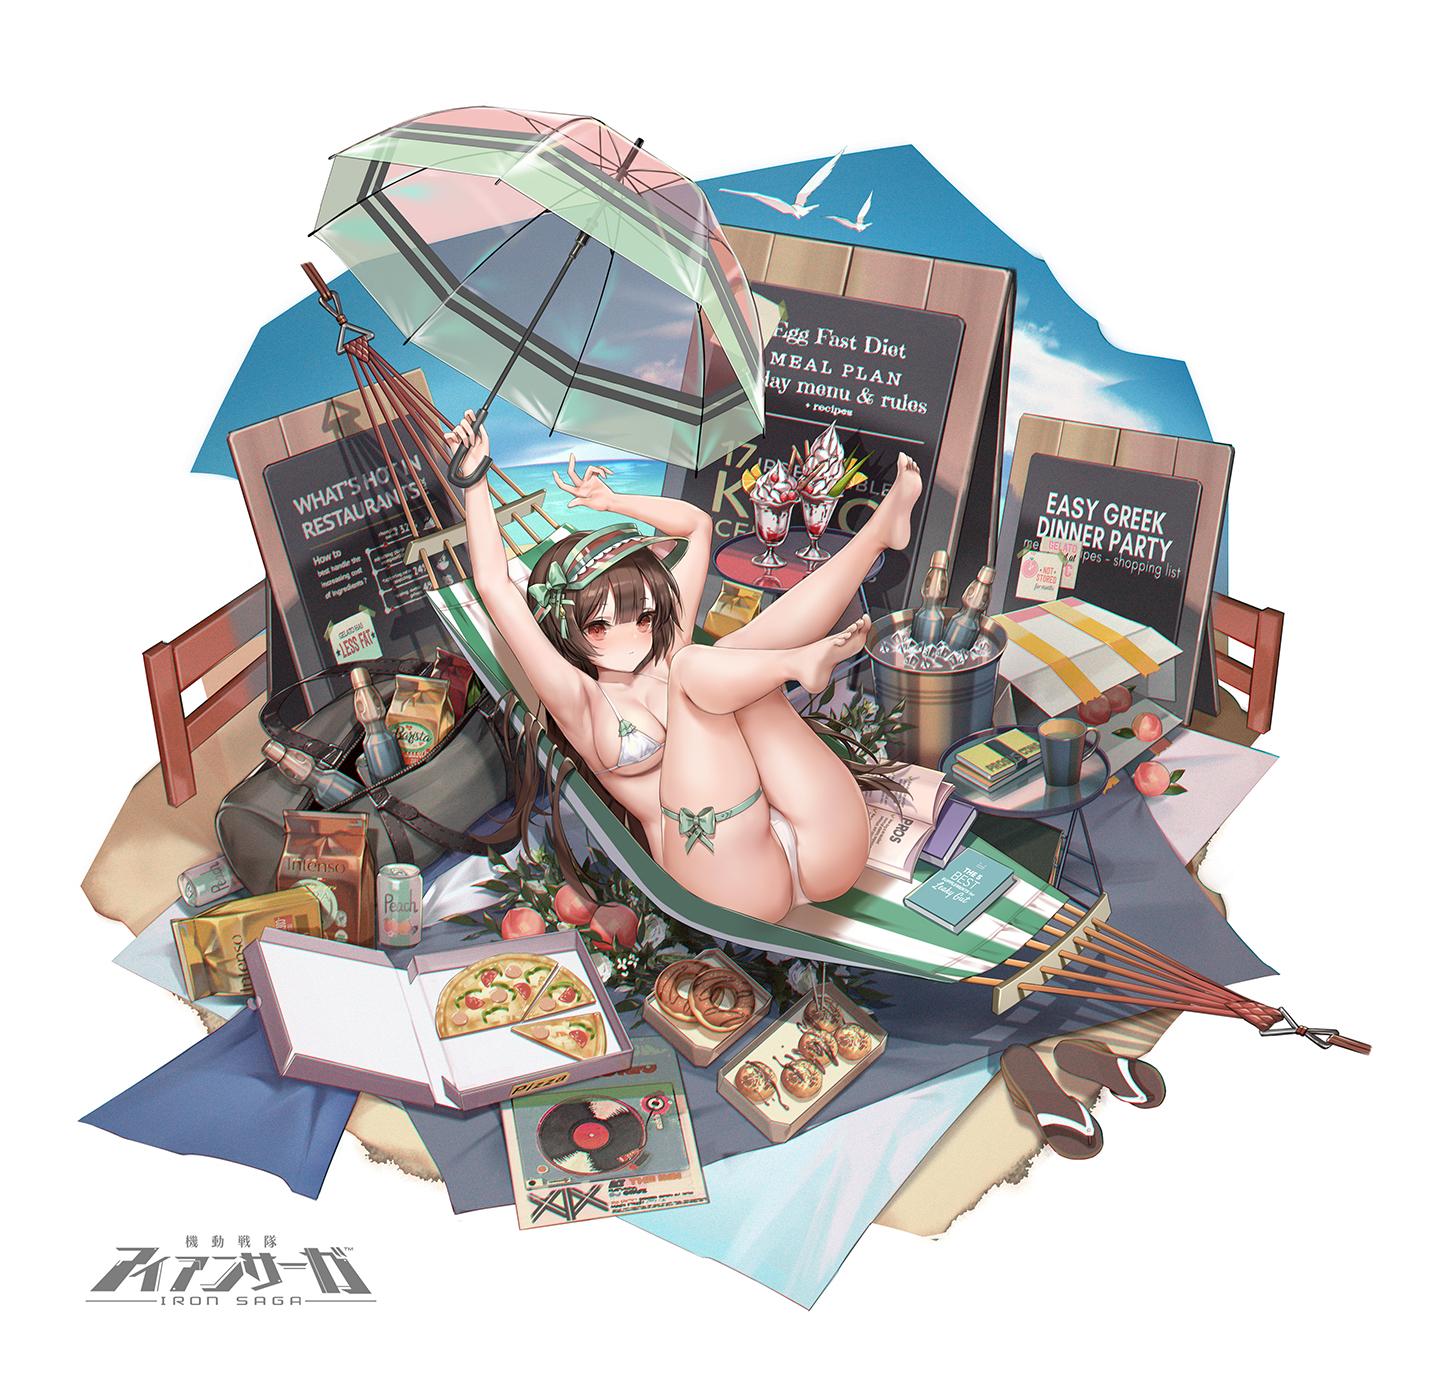 Anime 1445x1390 anime anime girls digital art artwork 2D portrait iron saga zjsstc bikini legs up ass D. (artist)